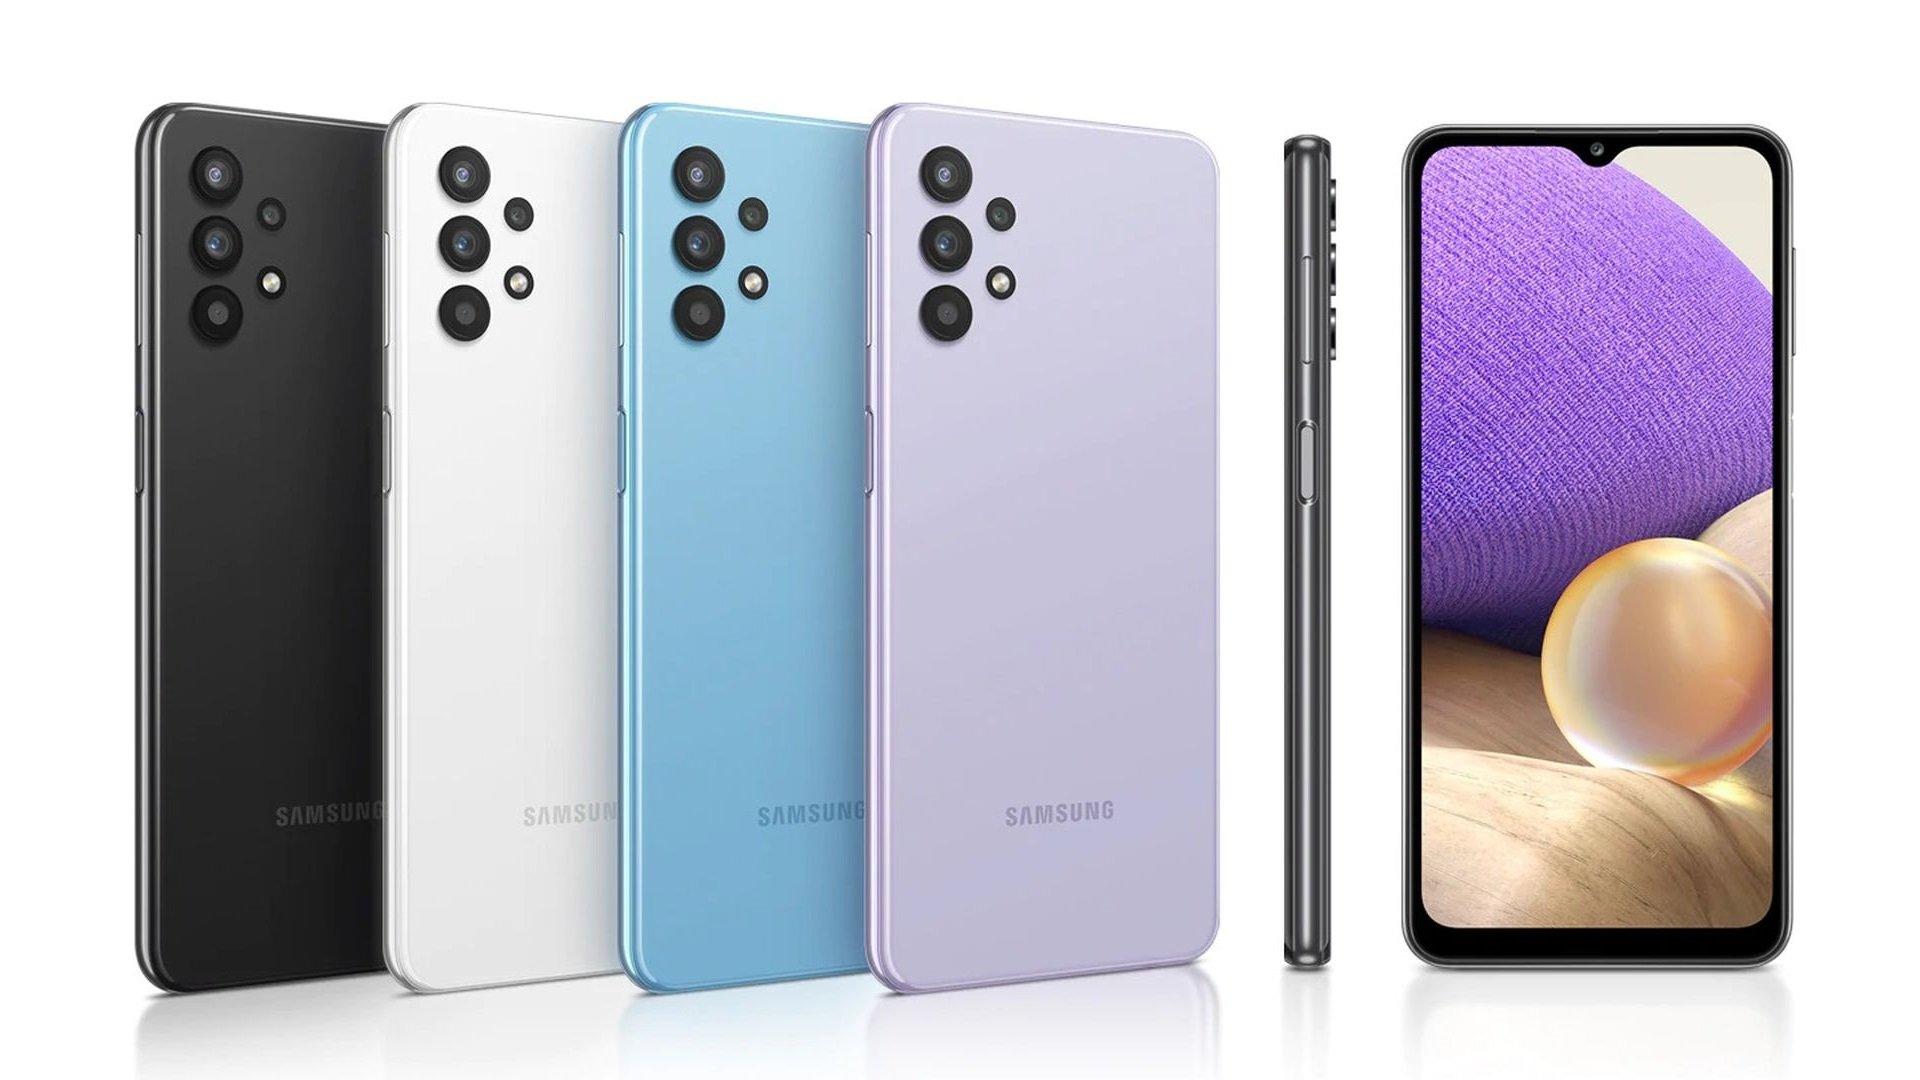 Samsung Galaxy A32 5G - SamMobile